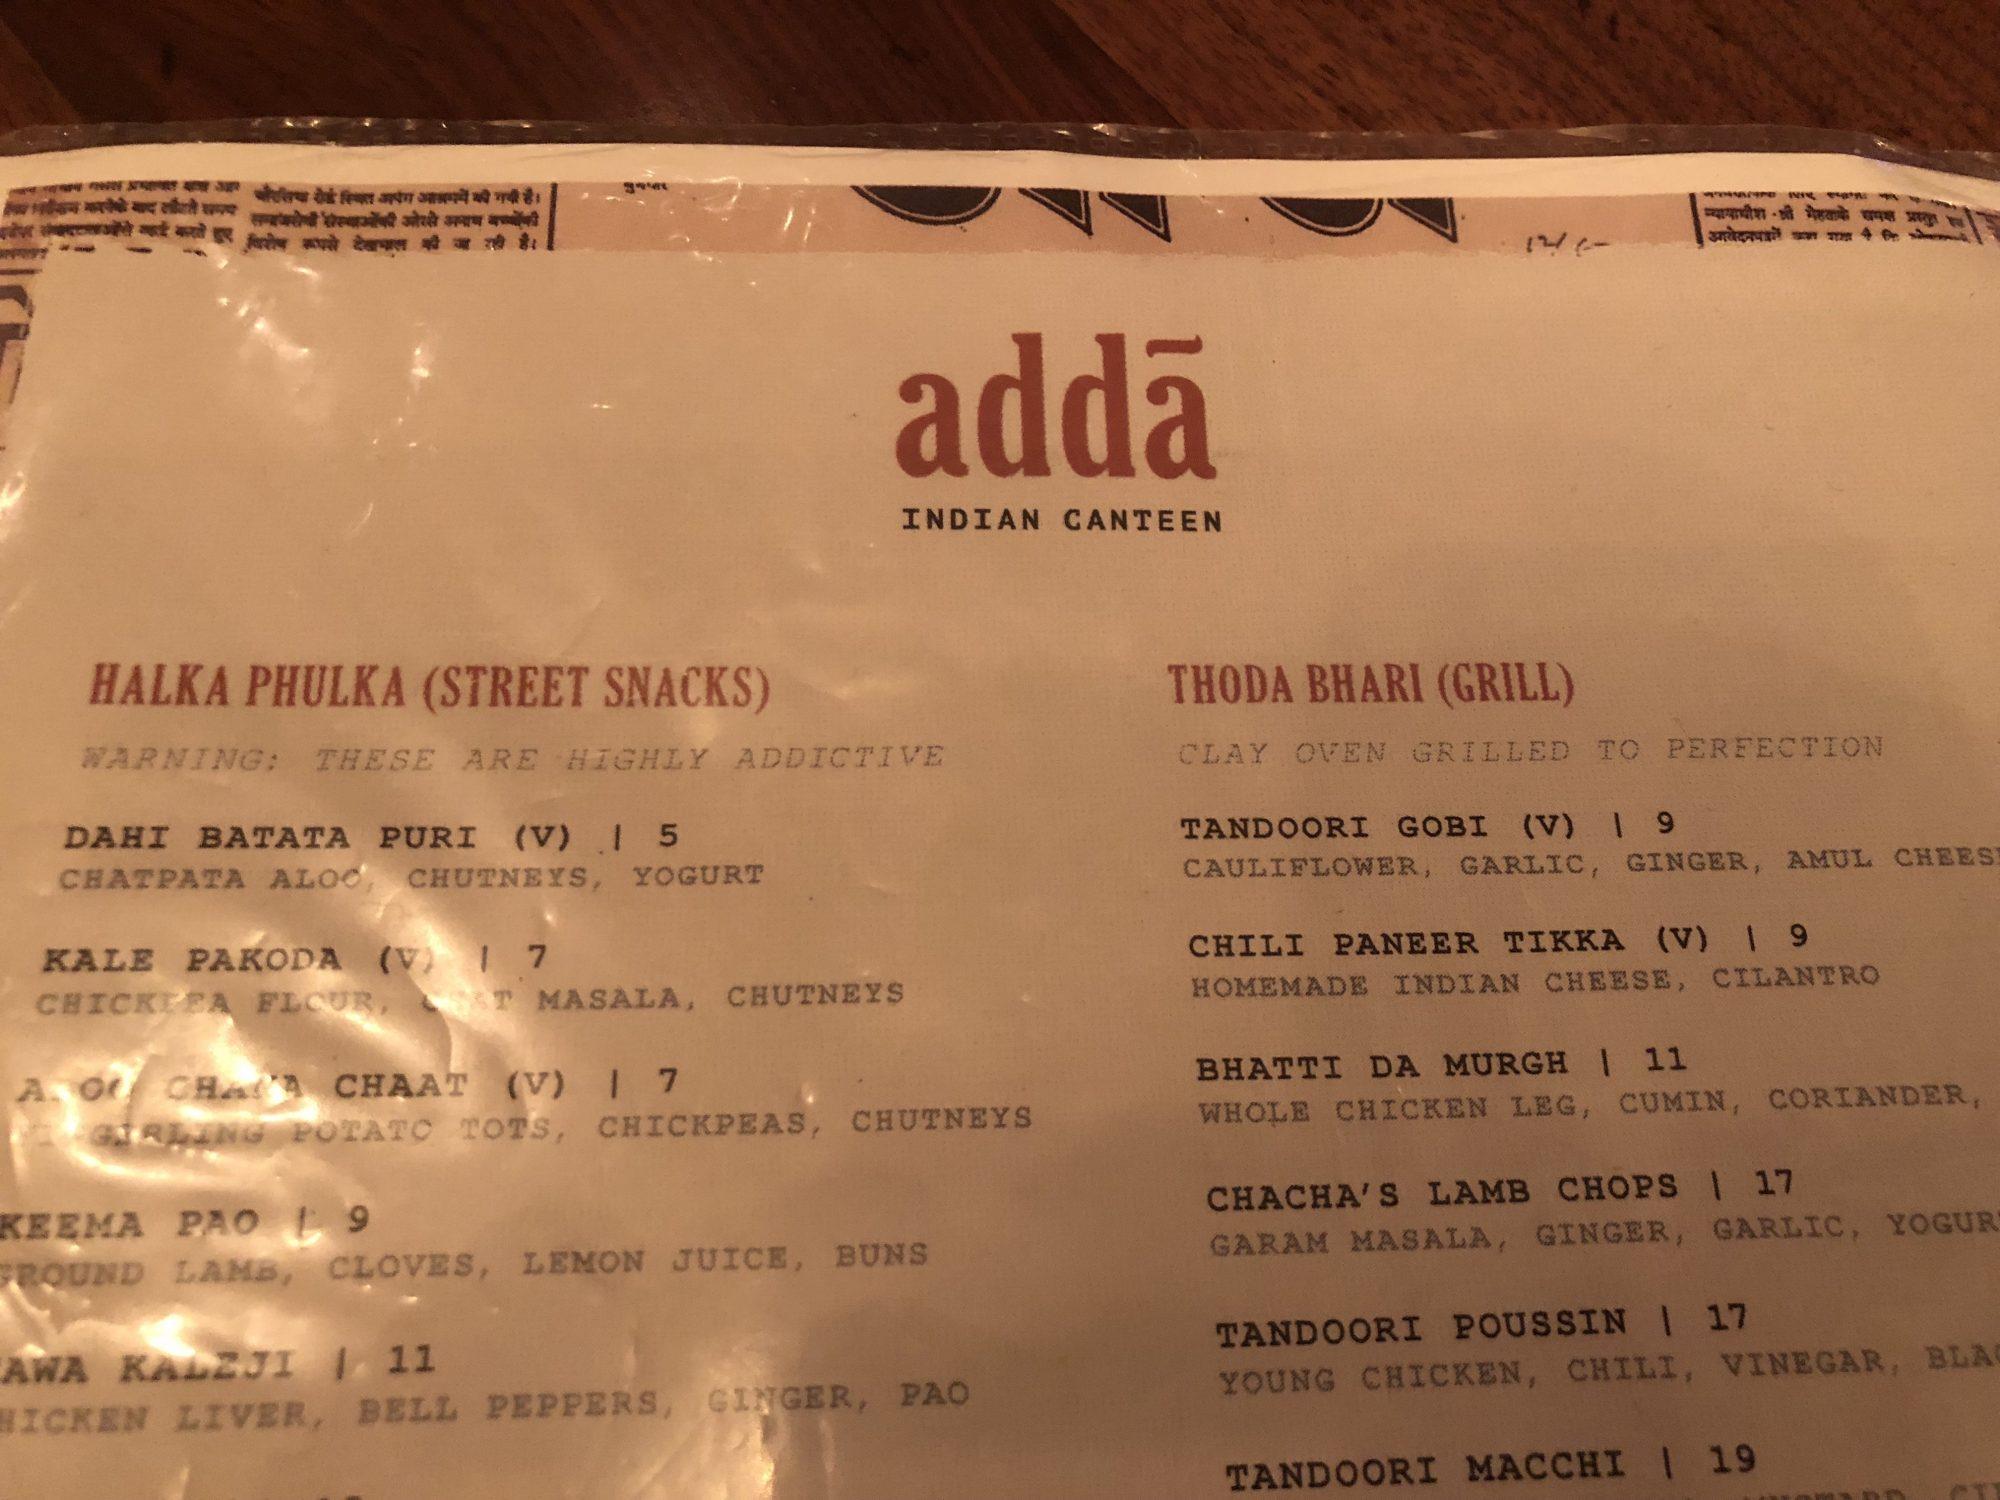 Adda Indian Canteen